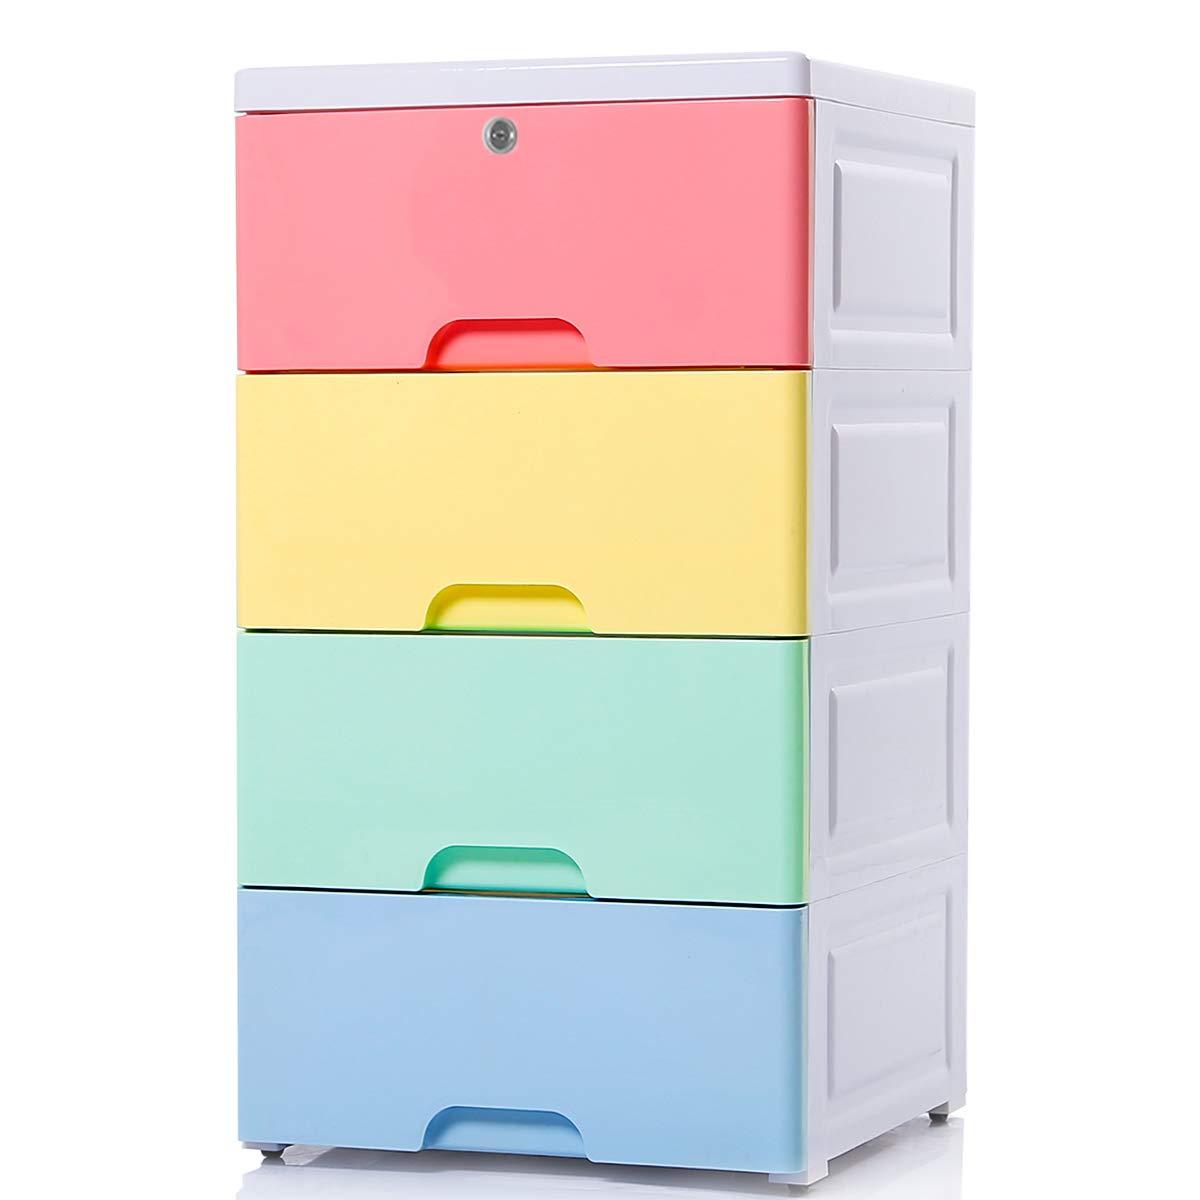 Nafenai 4 Drawer Stroage Dresser,Kids Storage Cabinet,Colorful